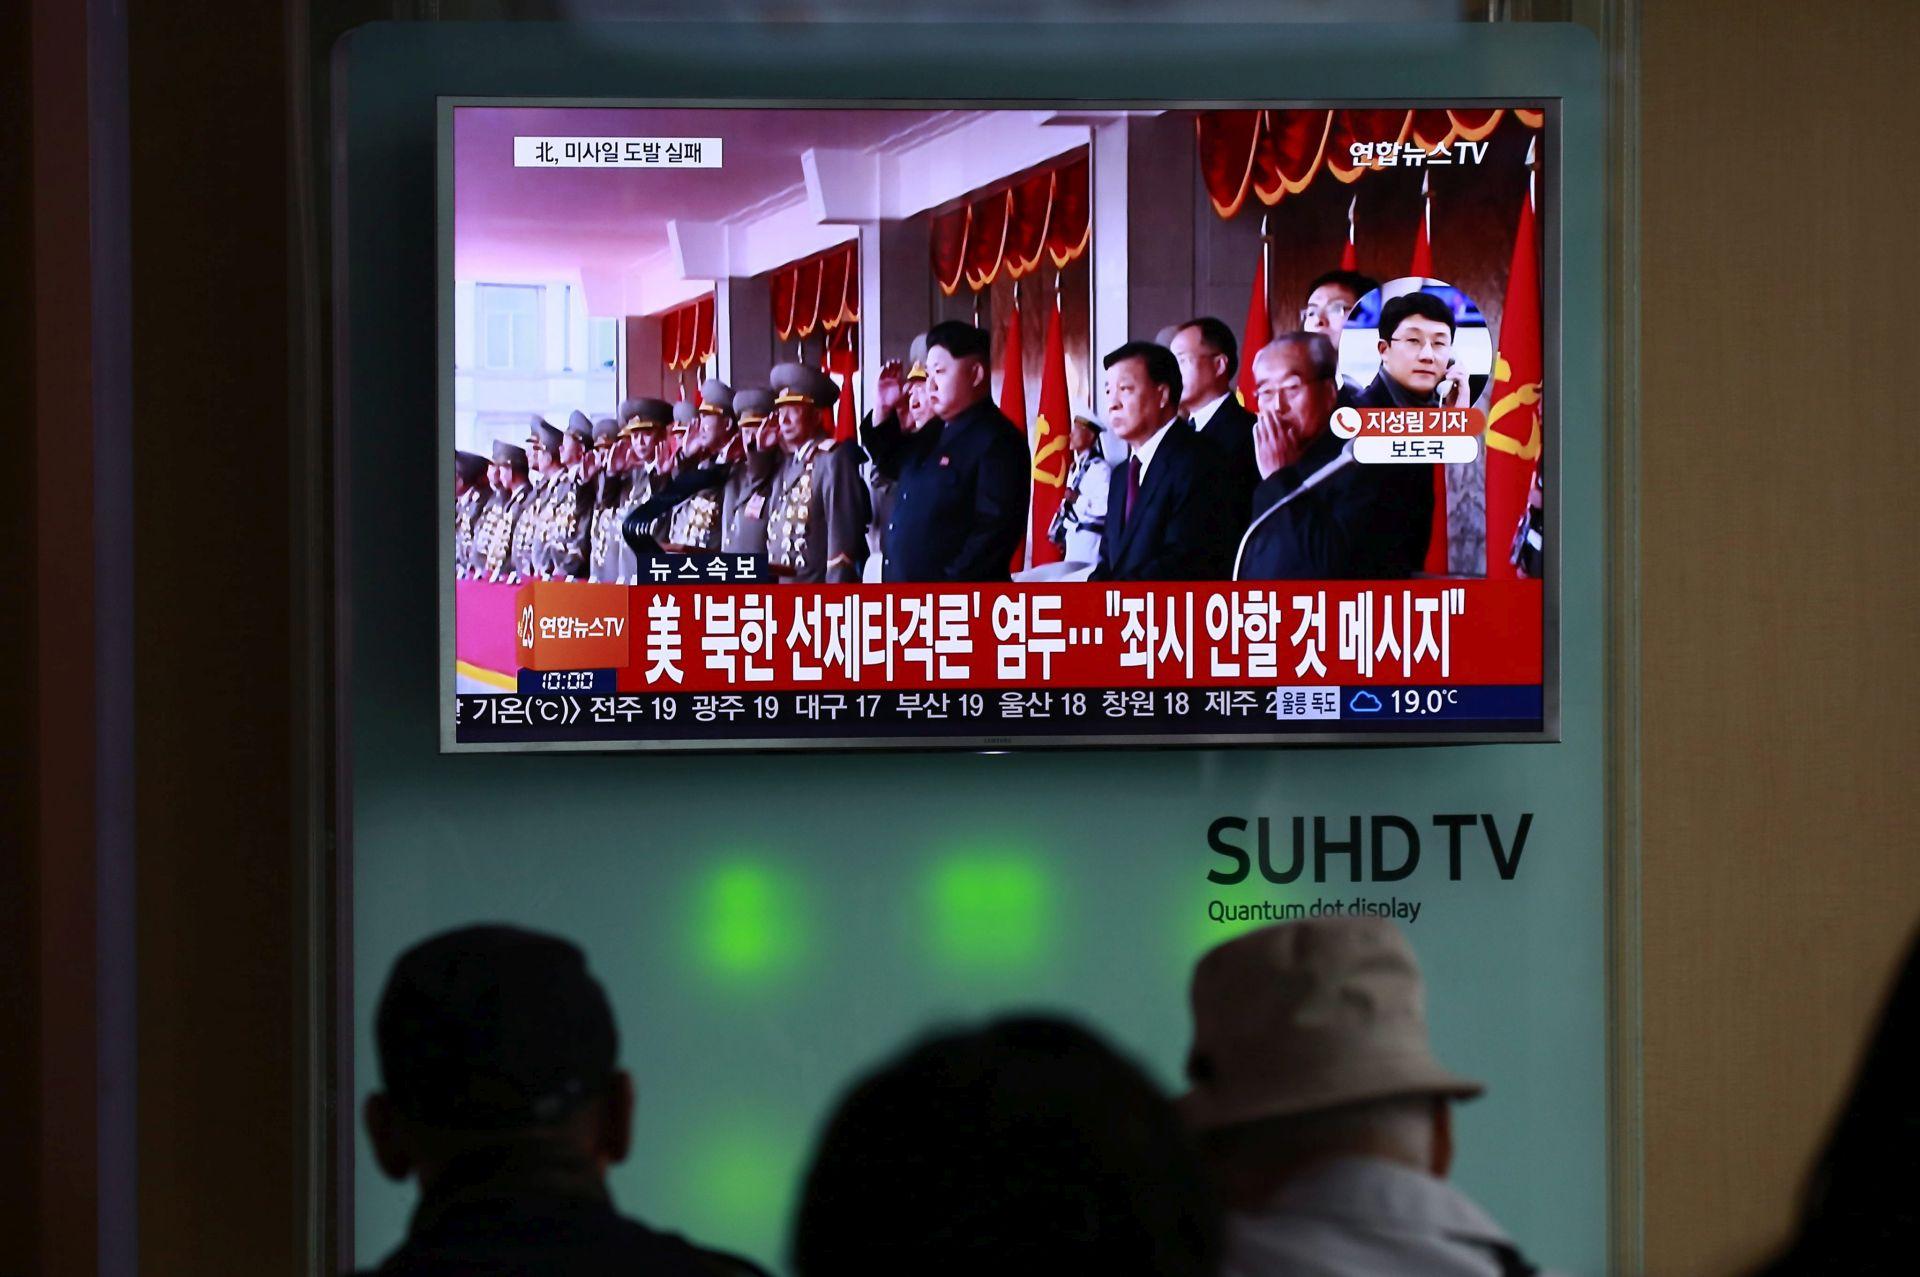 UPOZORENJE JUŽNE KOREJE 'Pjongjang je spreman za sljedeći nuklearni test'